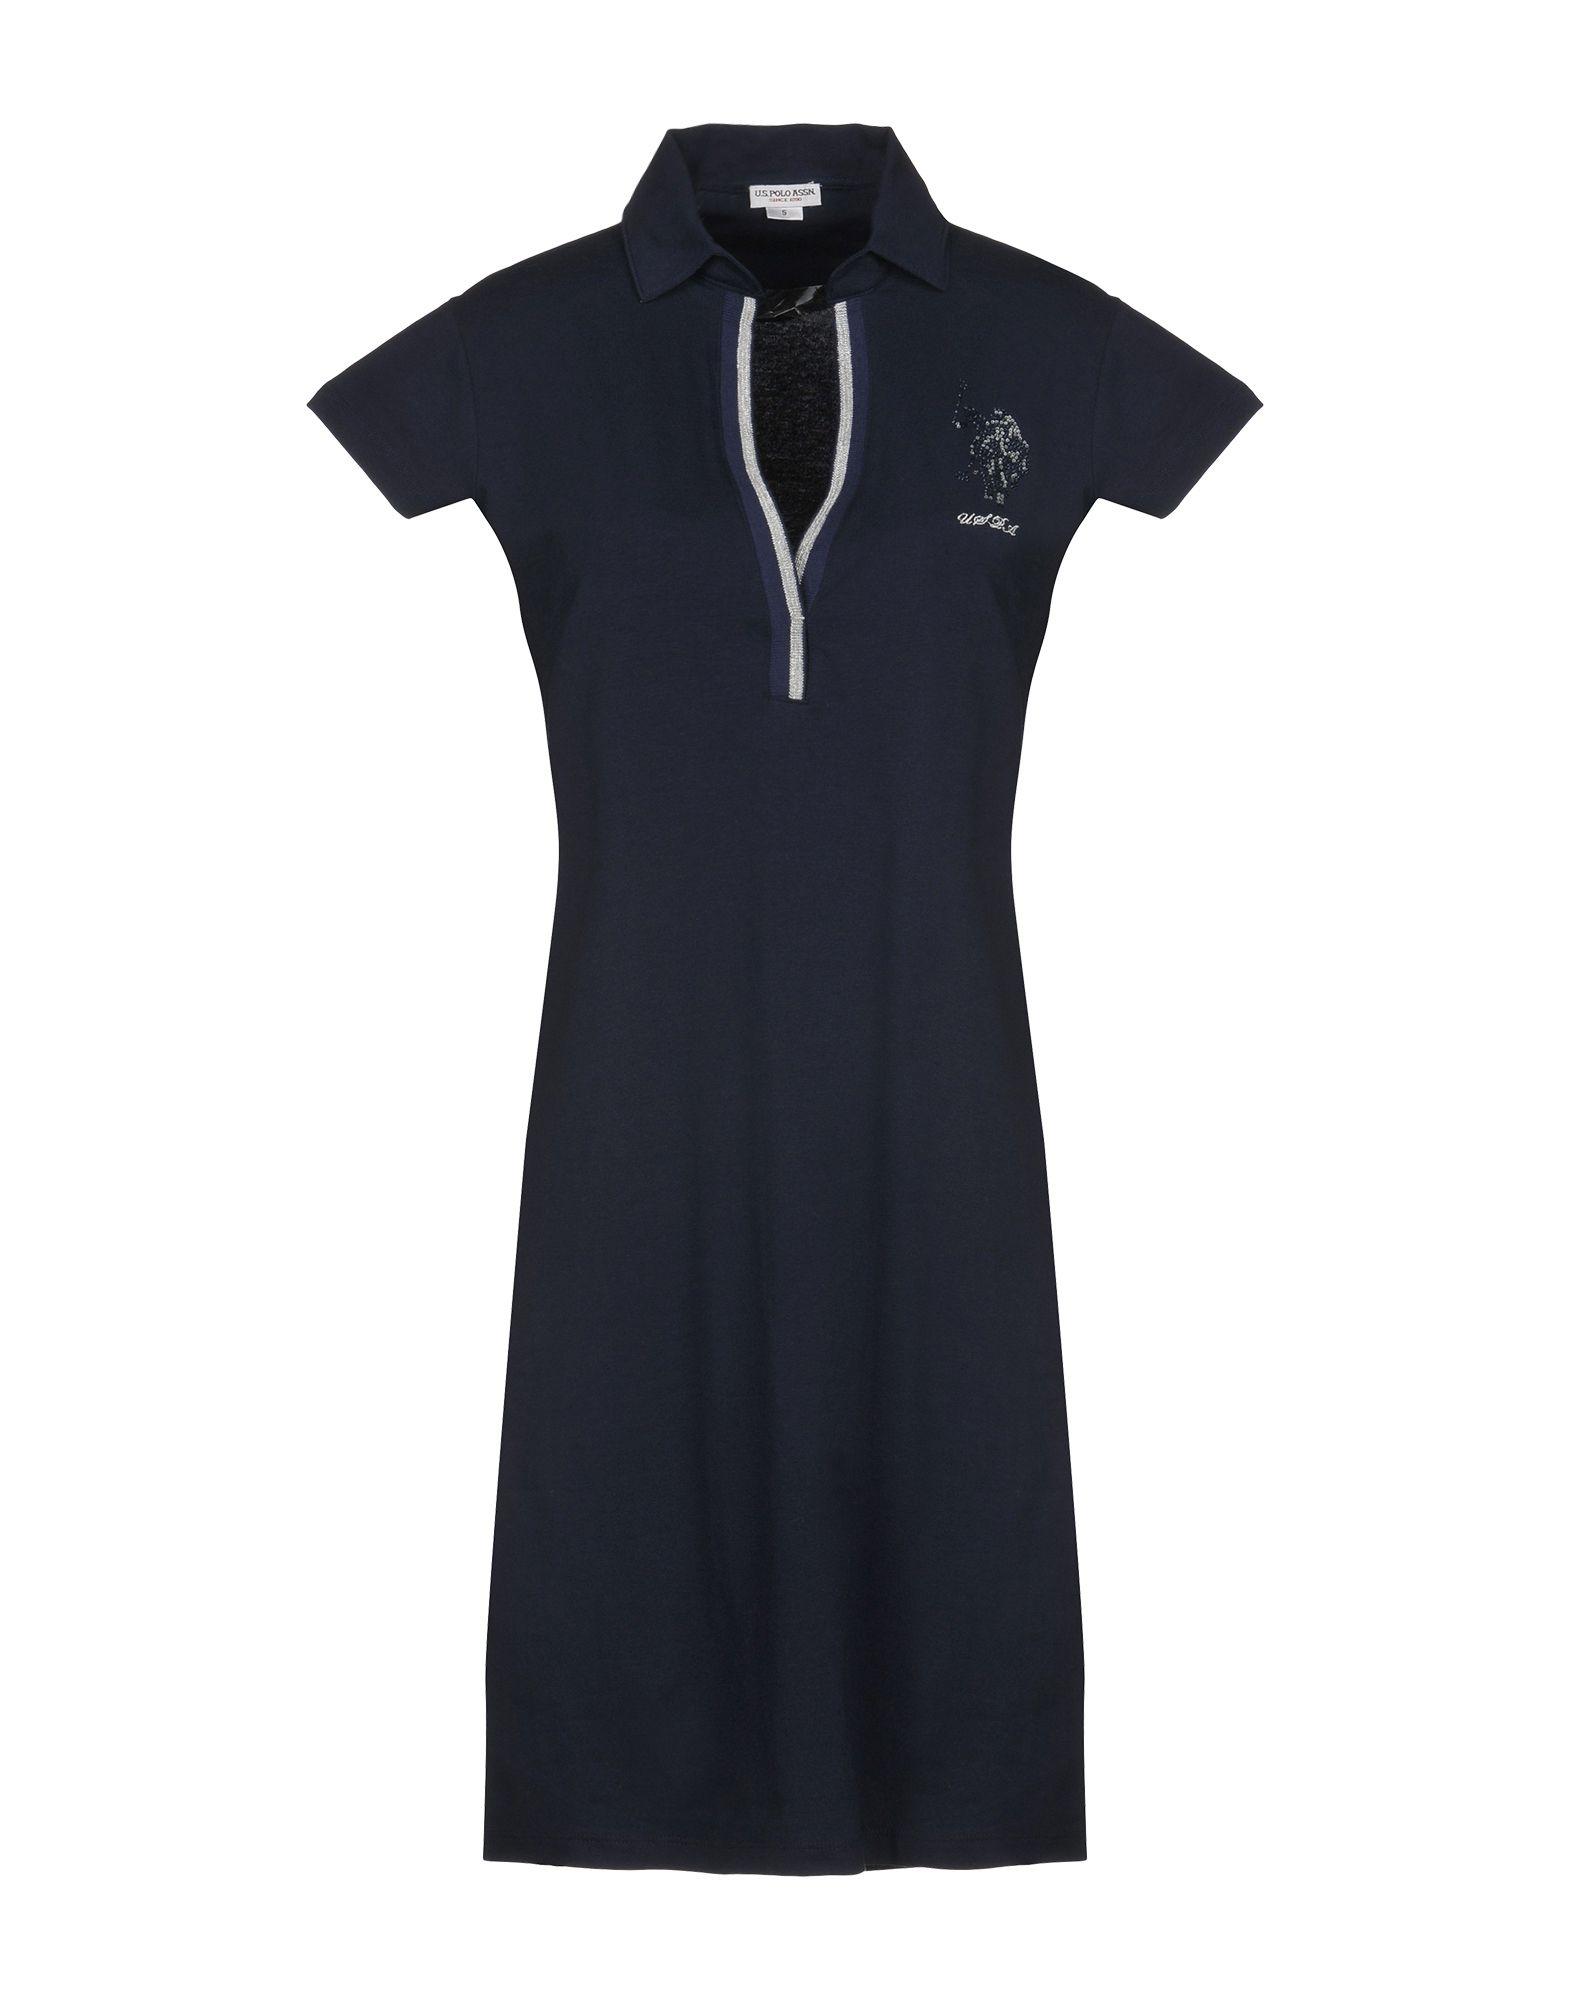 U.S.POLO ASSN. Damen Kurzes Kleid Farbe Dunkelblau Größe 4